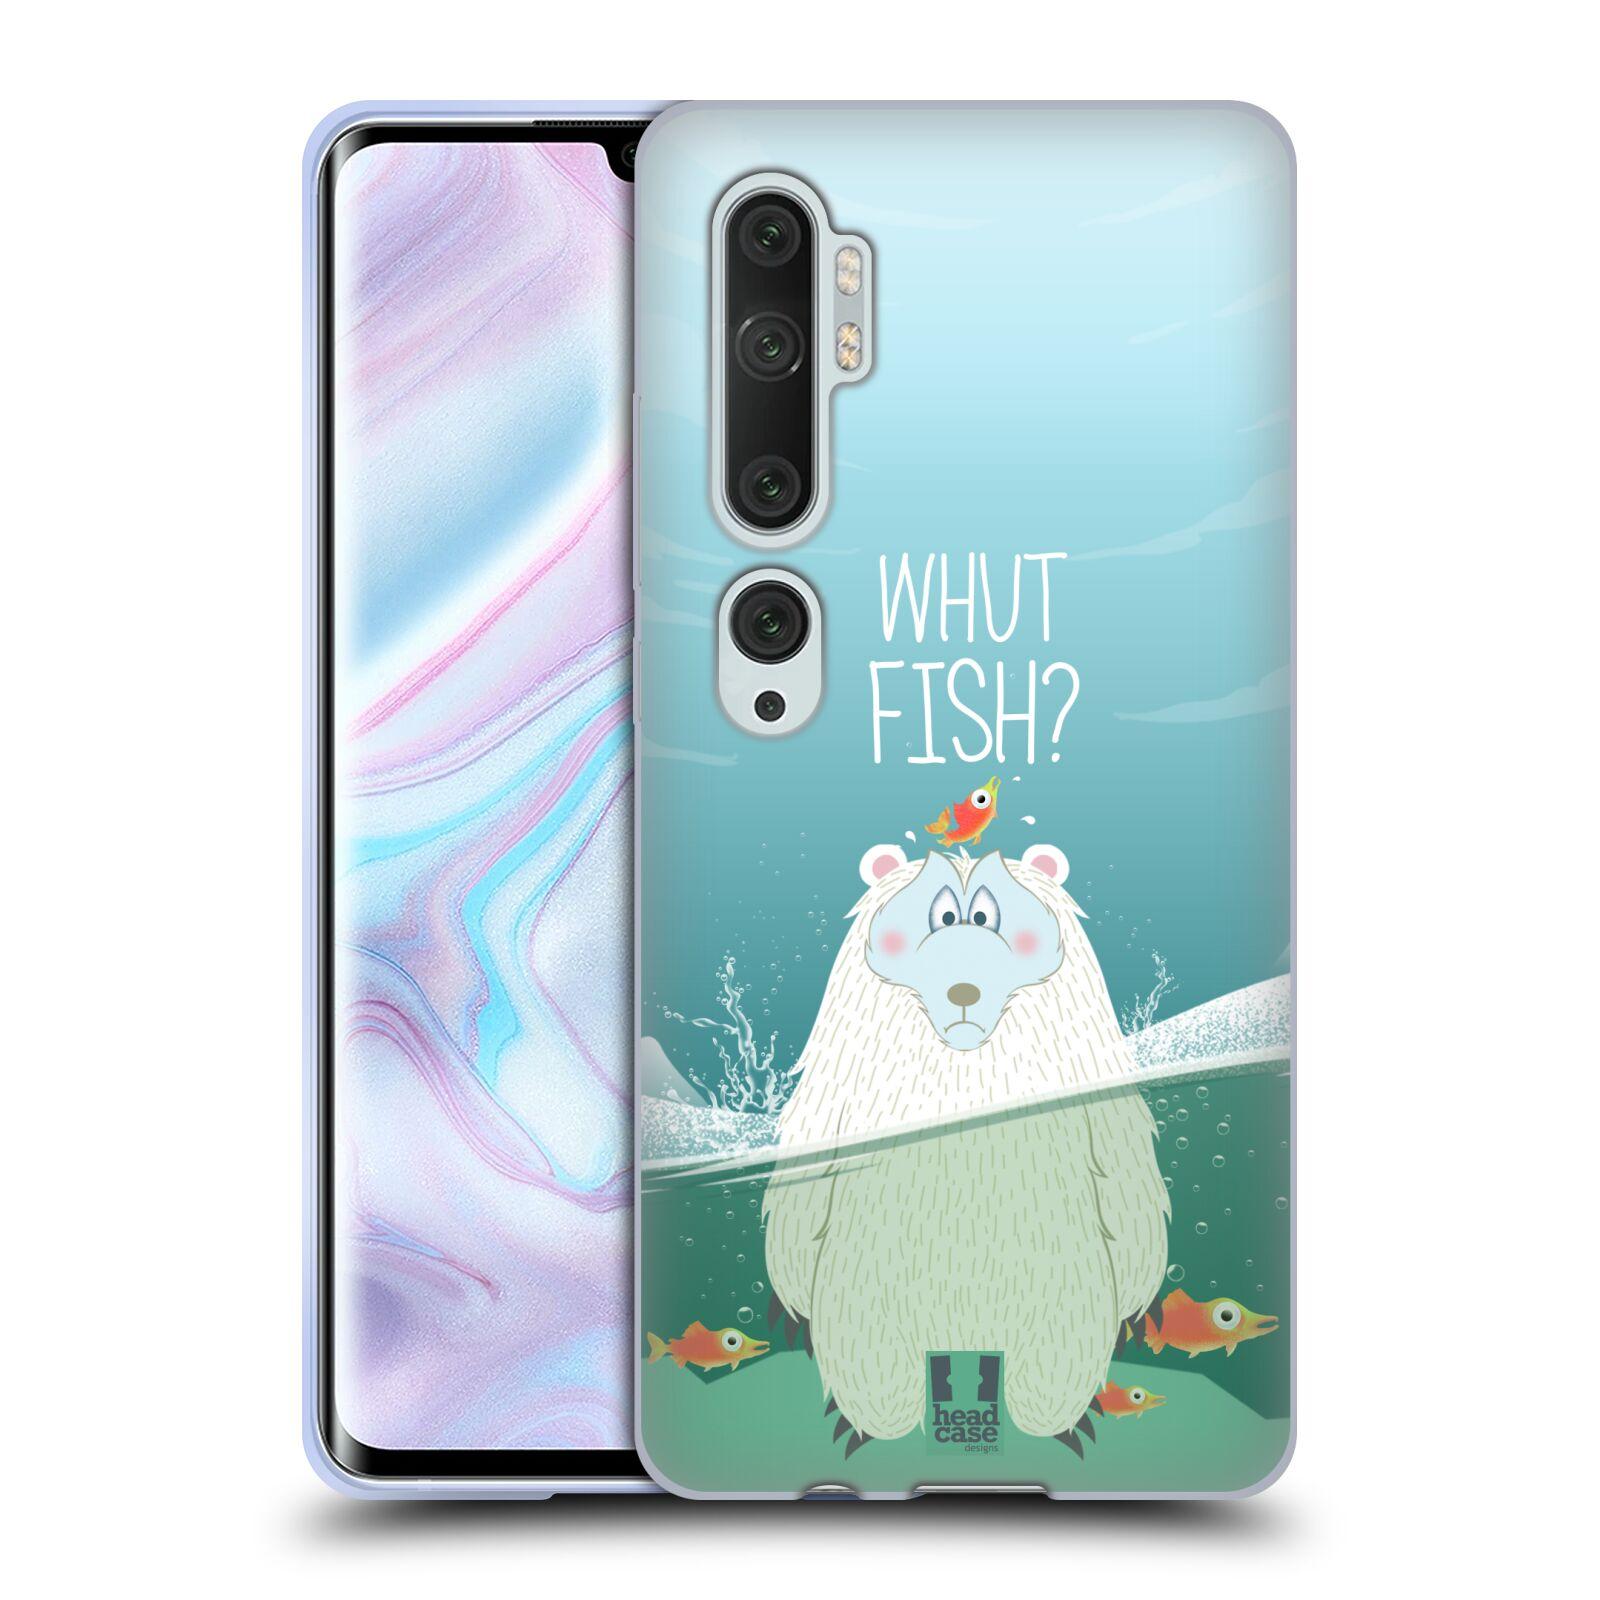 Silikonové pouzdro na mobil Xiaomi Mi Note 10 / 10 Pro - Head Case - Medvěd Whut Fish?